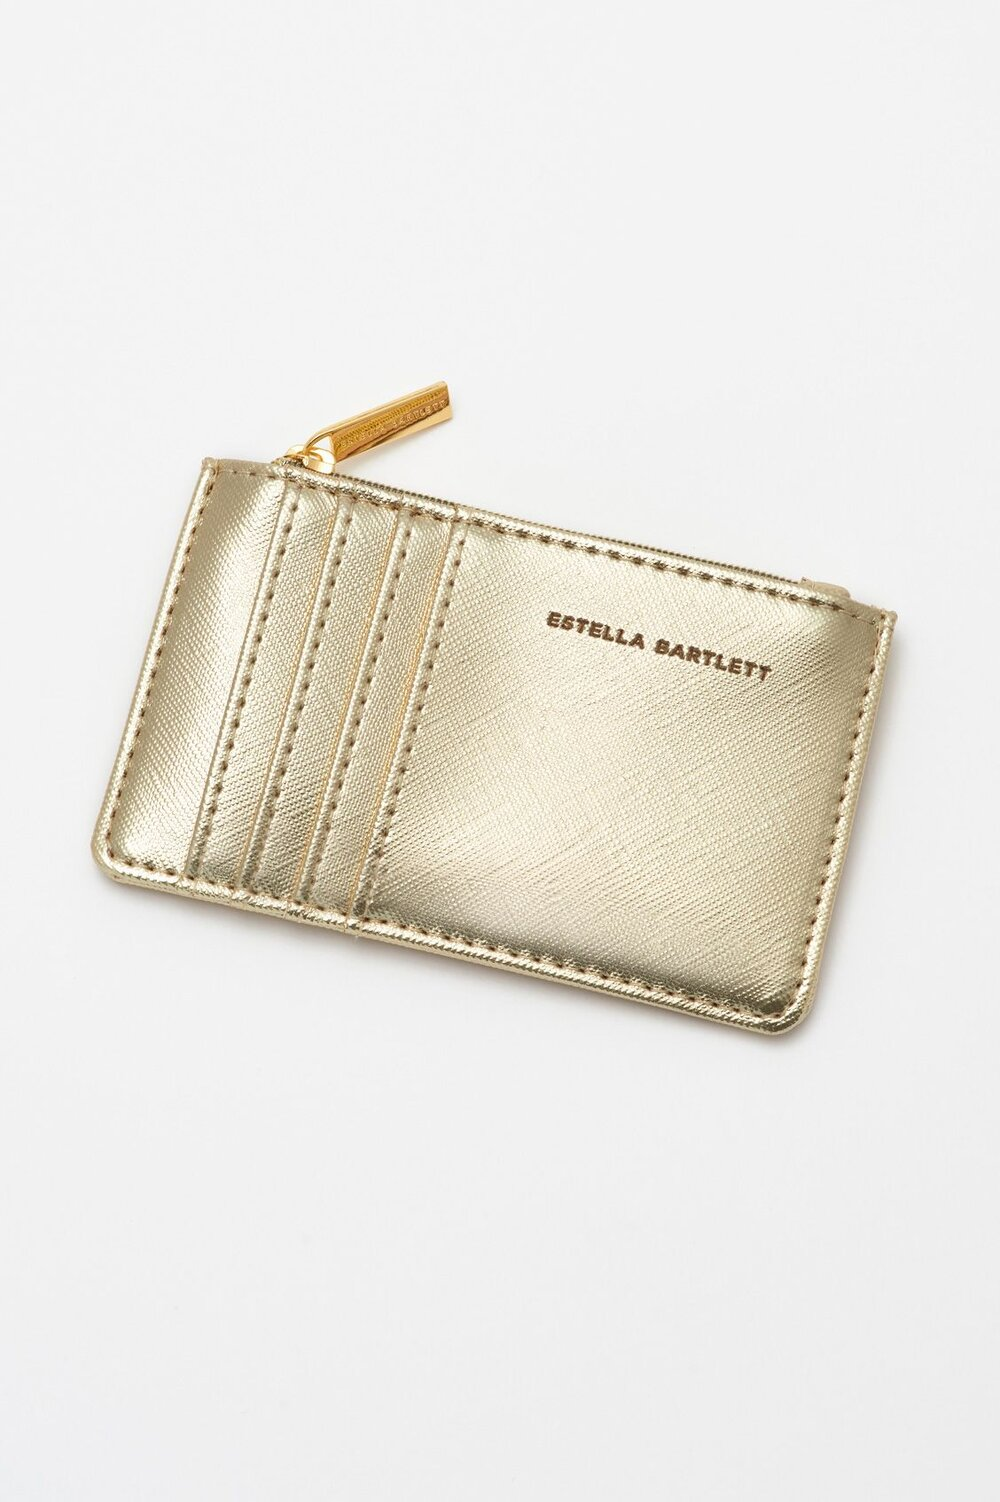 Estella Bartlett Card Holder - Applique 'RAINBOW' Gold